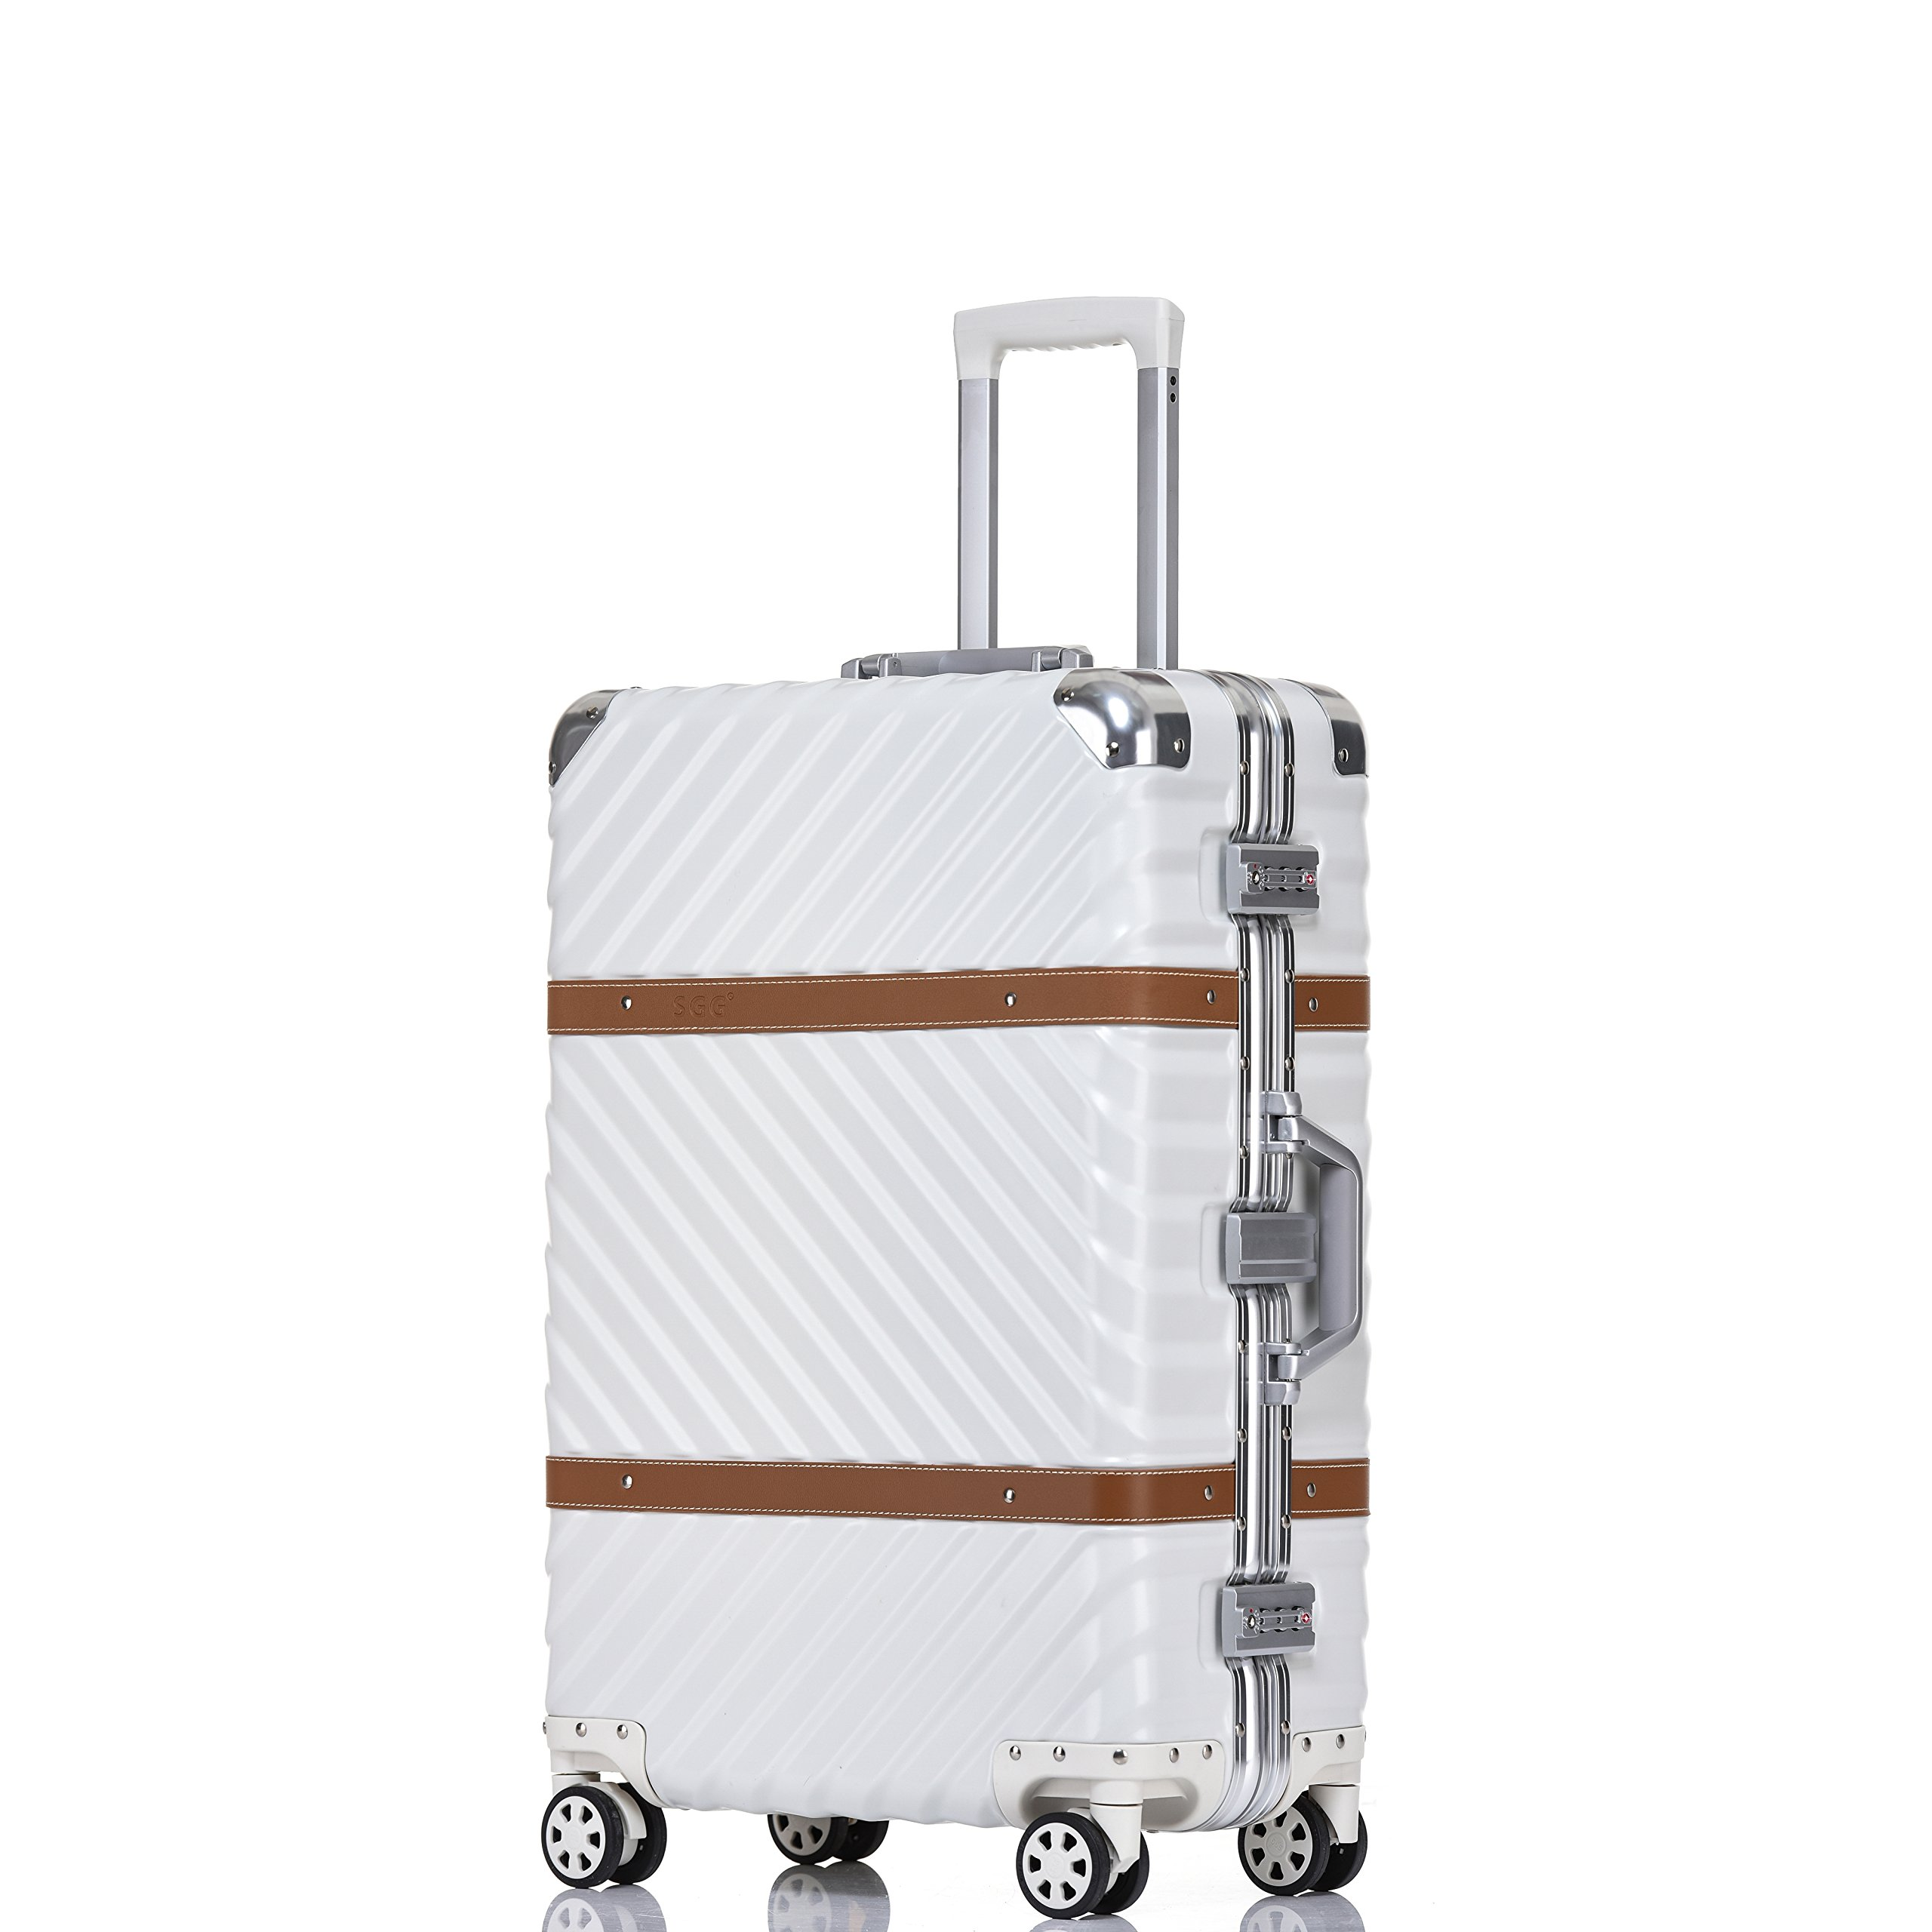 Travel Luggage, Hardside Aluminum Frame Fashion Suitcase with Detachable Spinner Wheels 28 Inch White